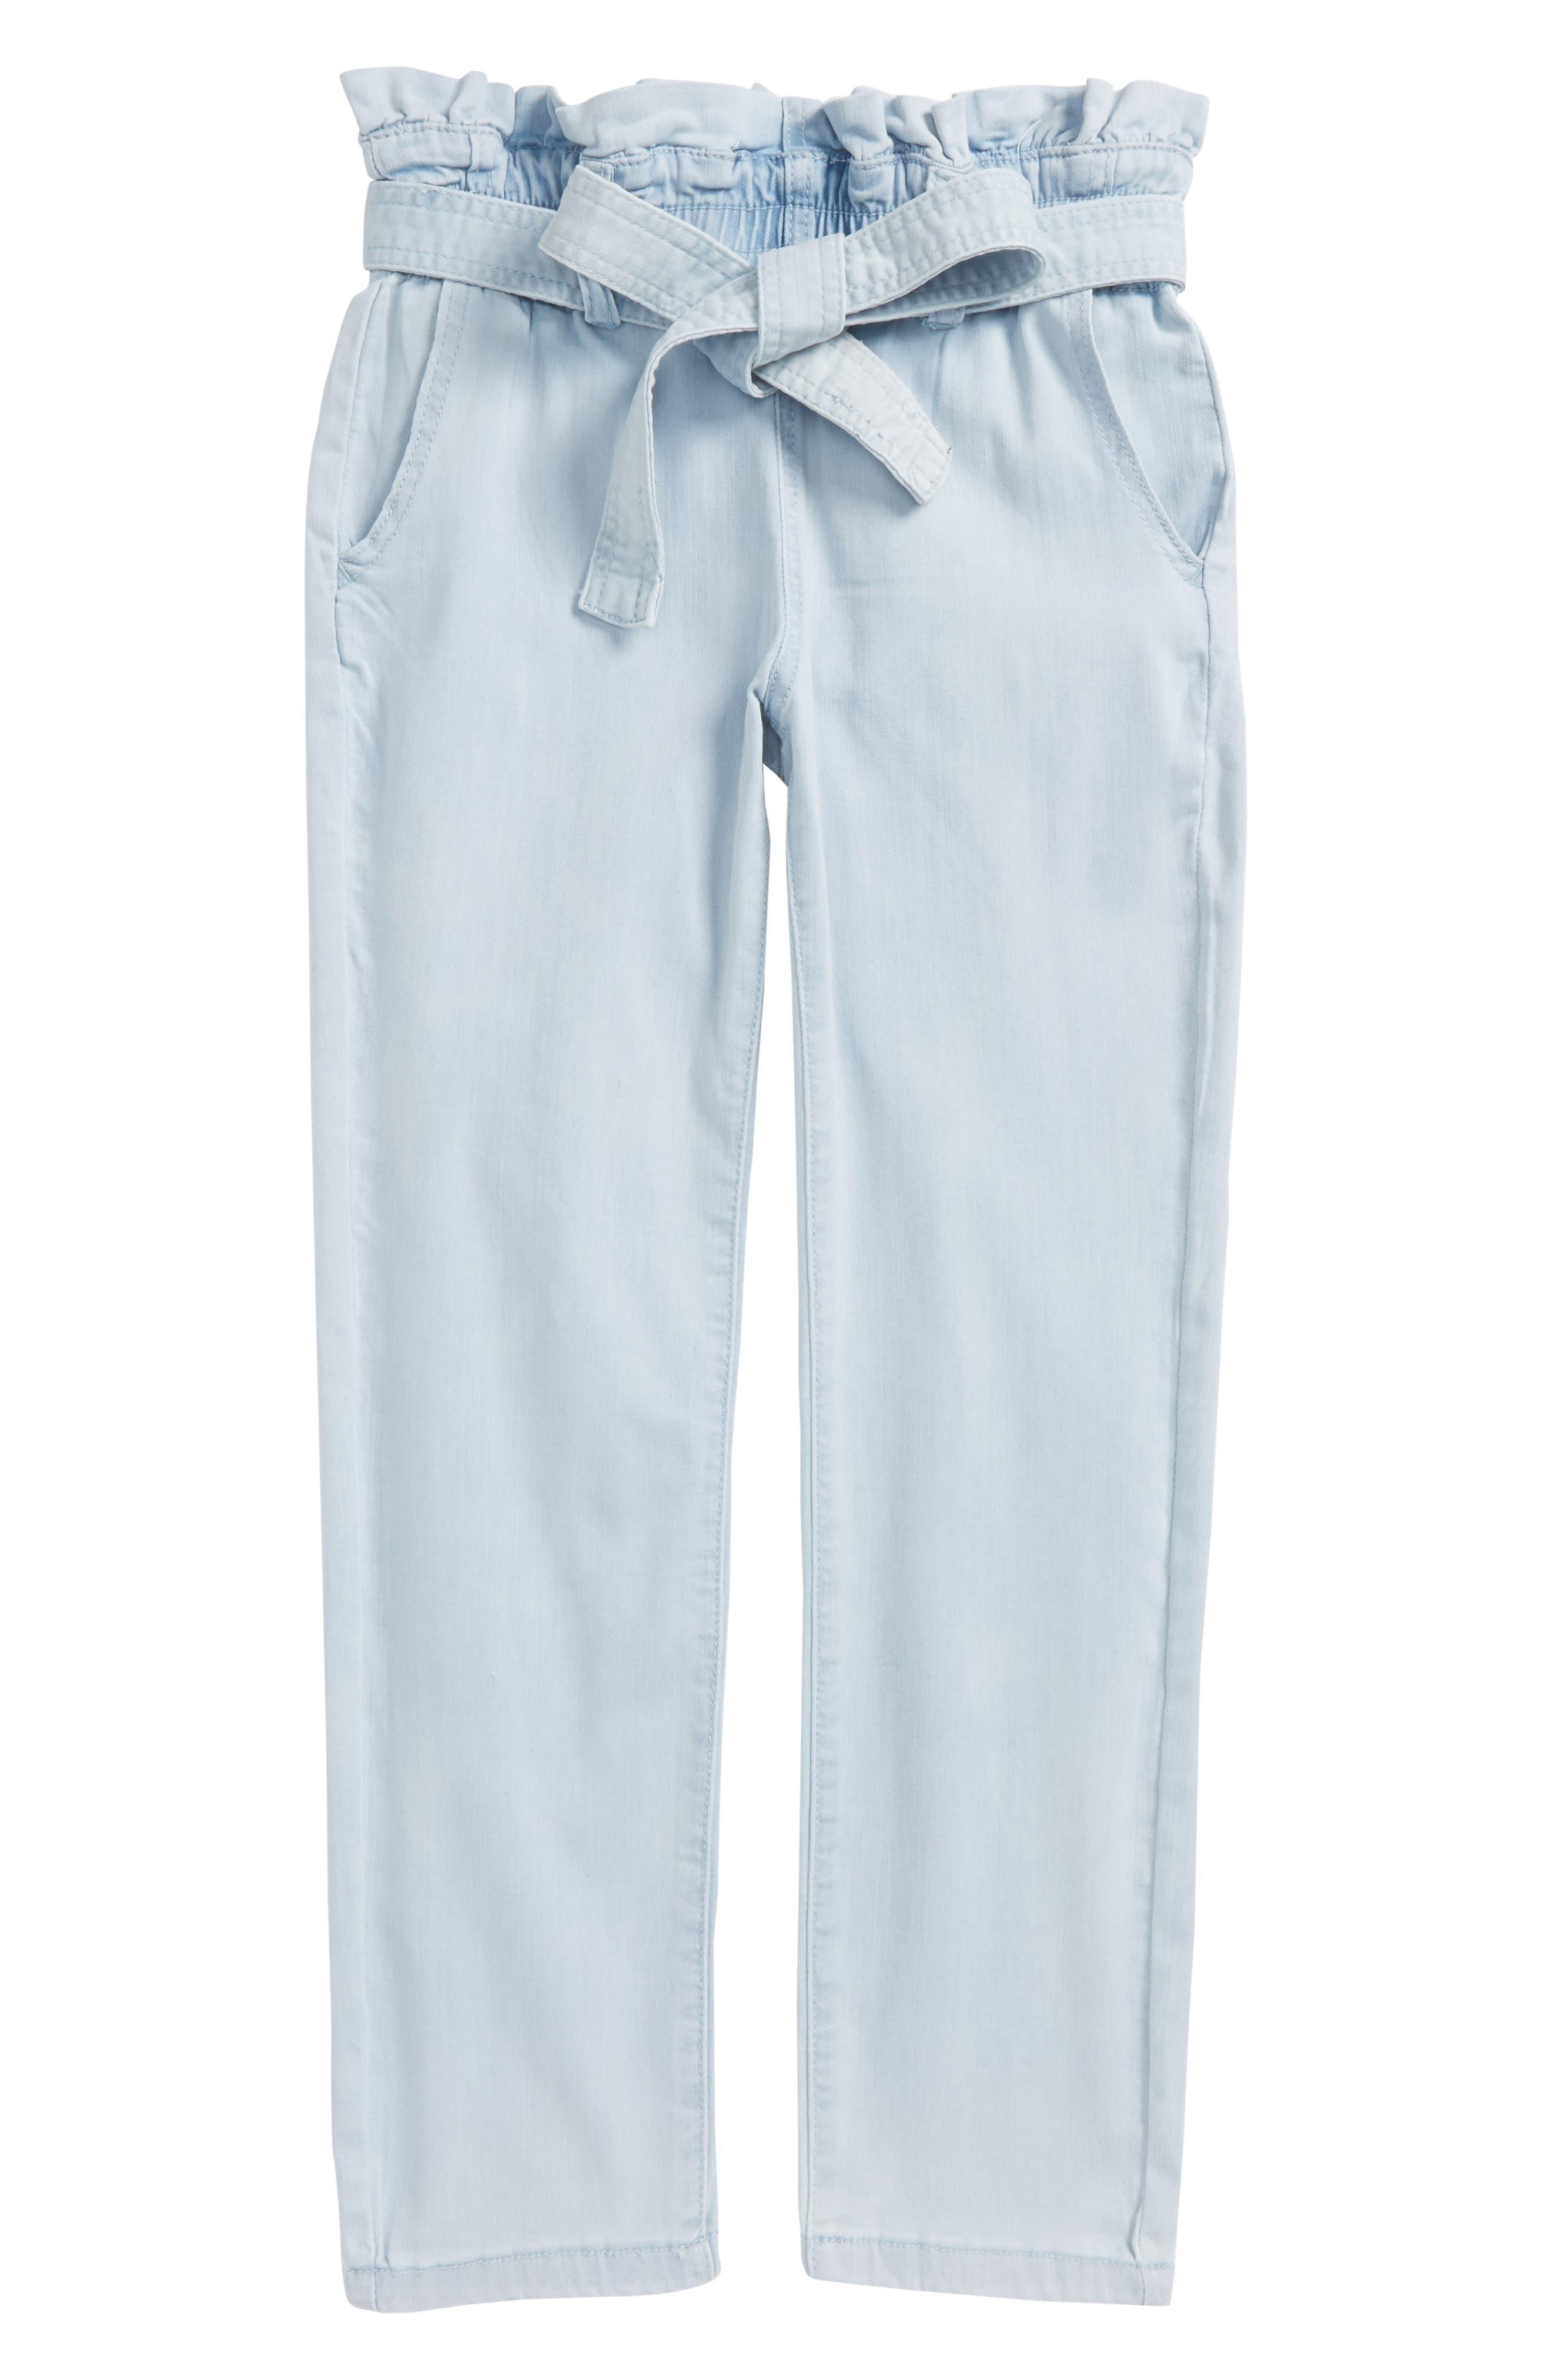 Alternate Image 1 Selected - ag adriano goldschmied kids Paper Bag Crop Pants (Big Girls)